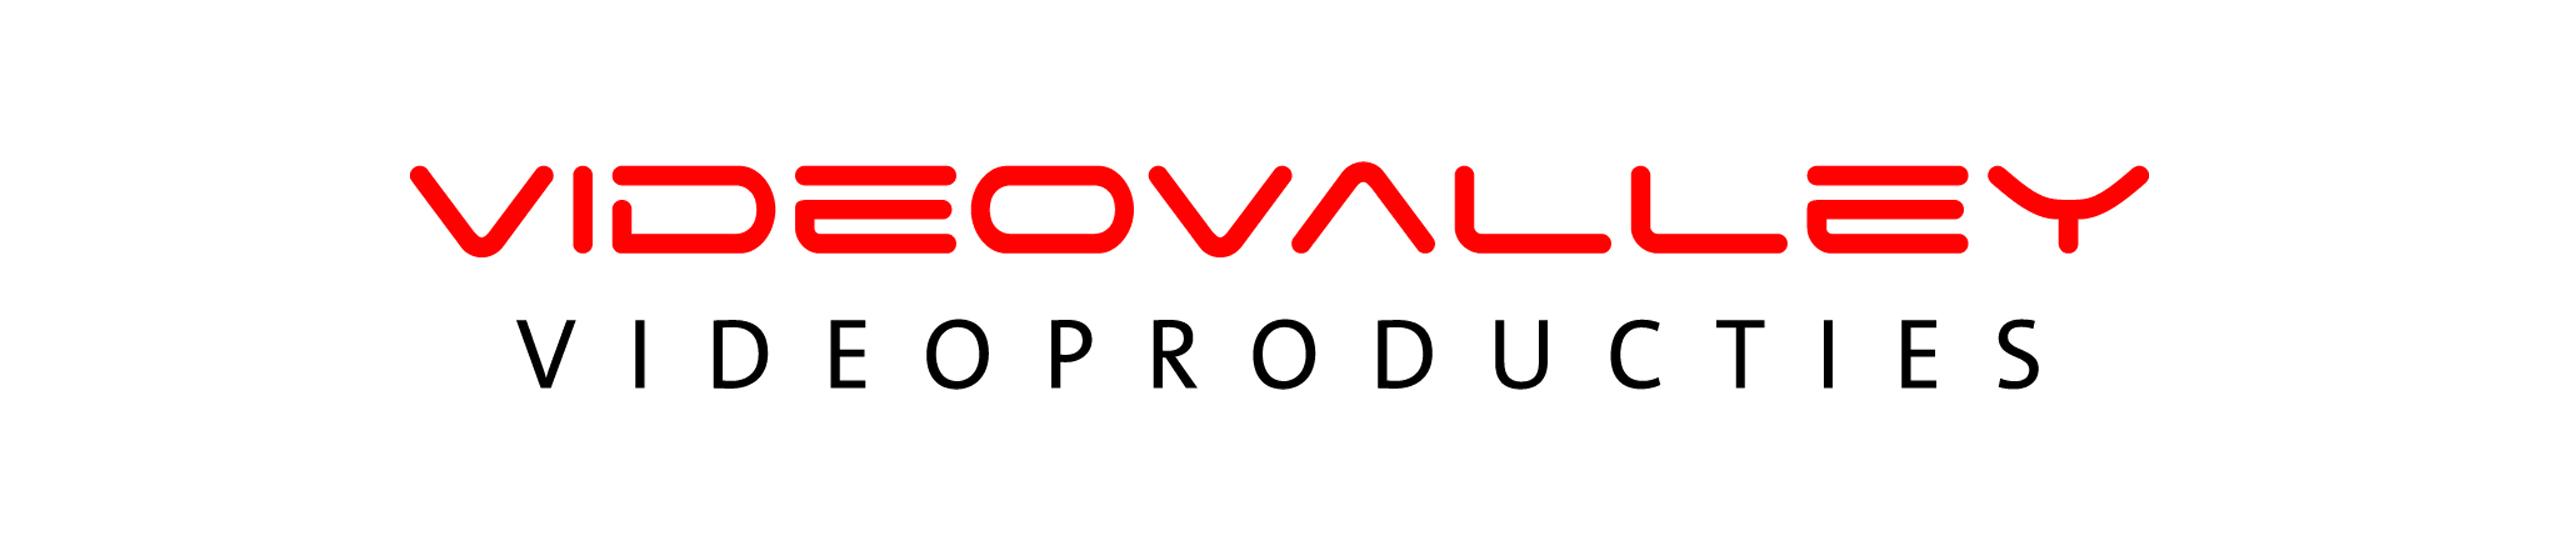 Videovalley TV & Videoproducties